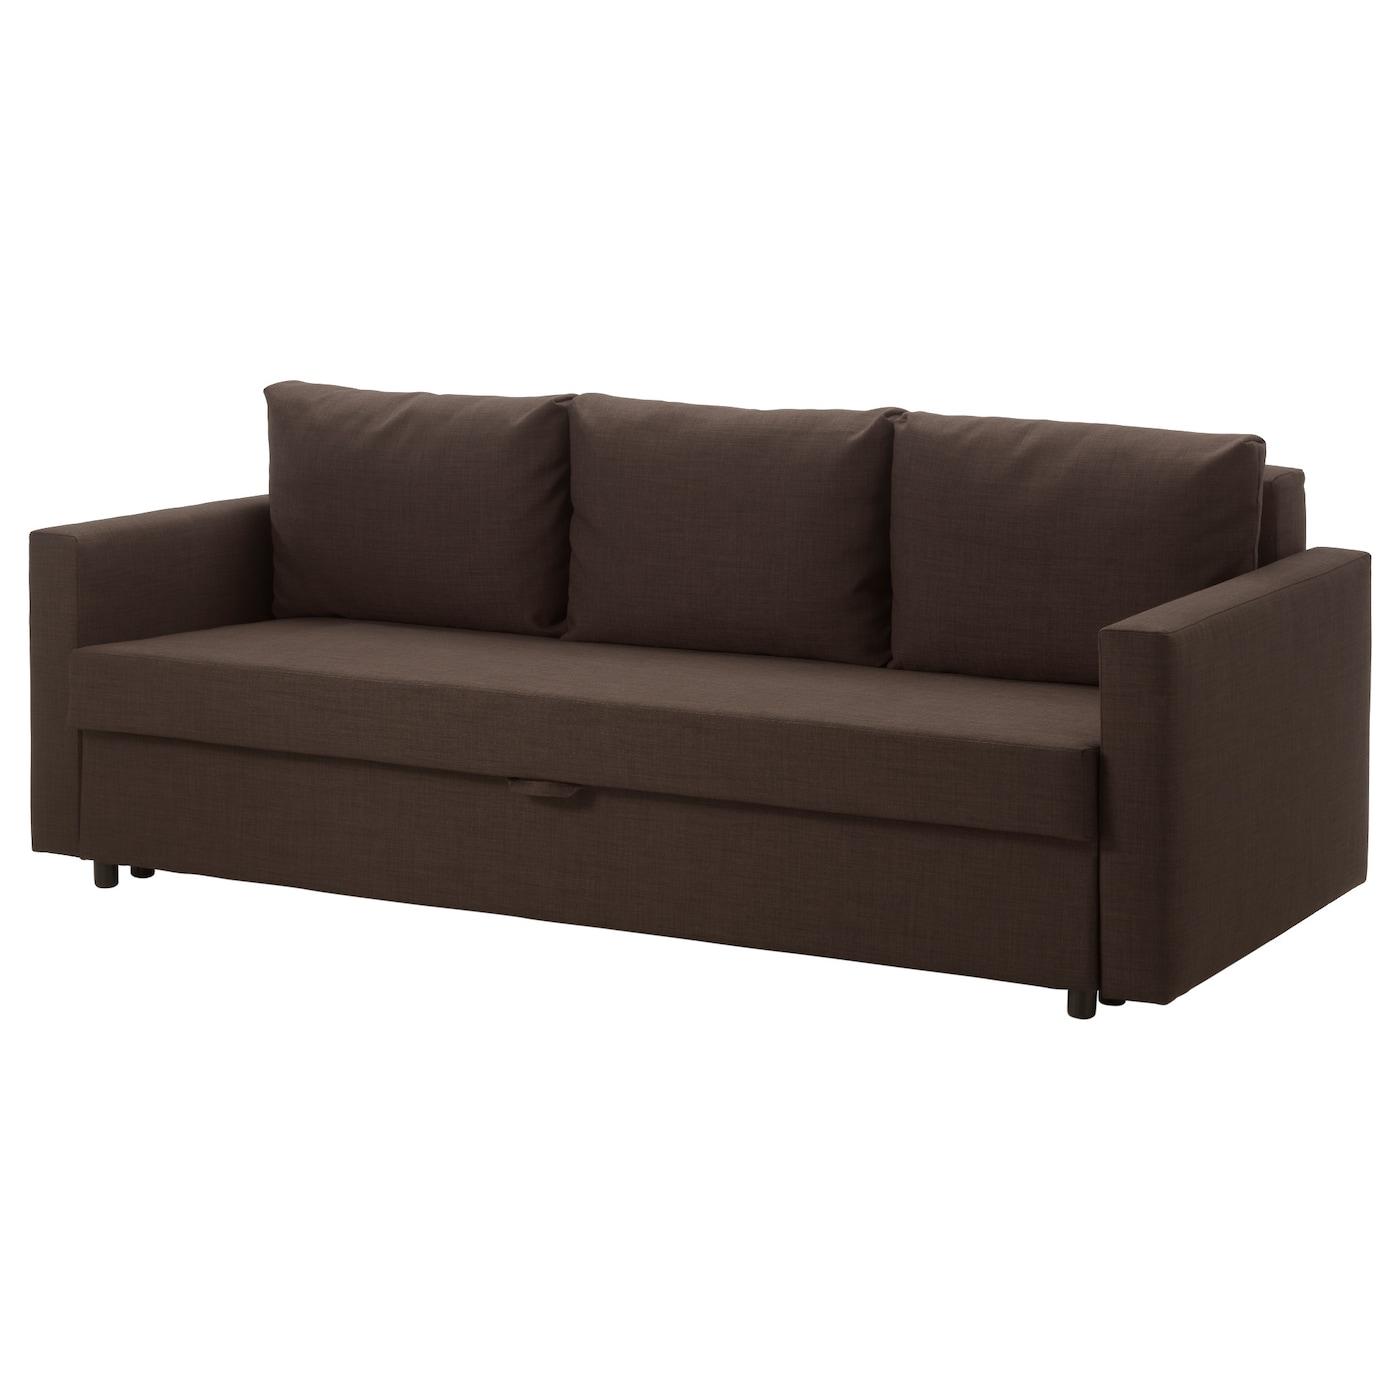 Friheten three seat sofa bed skiftebo brown ikea for Divano friheten